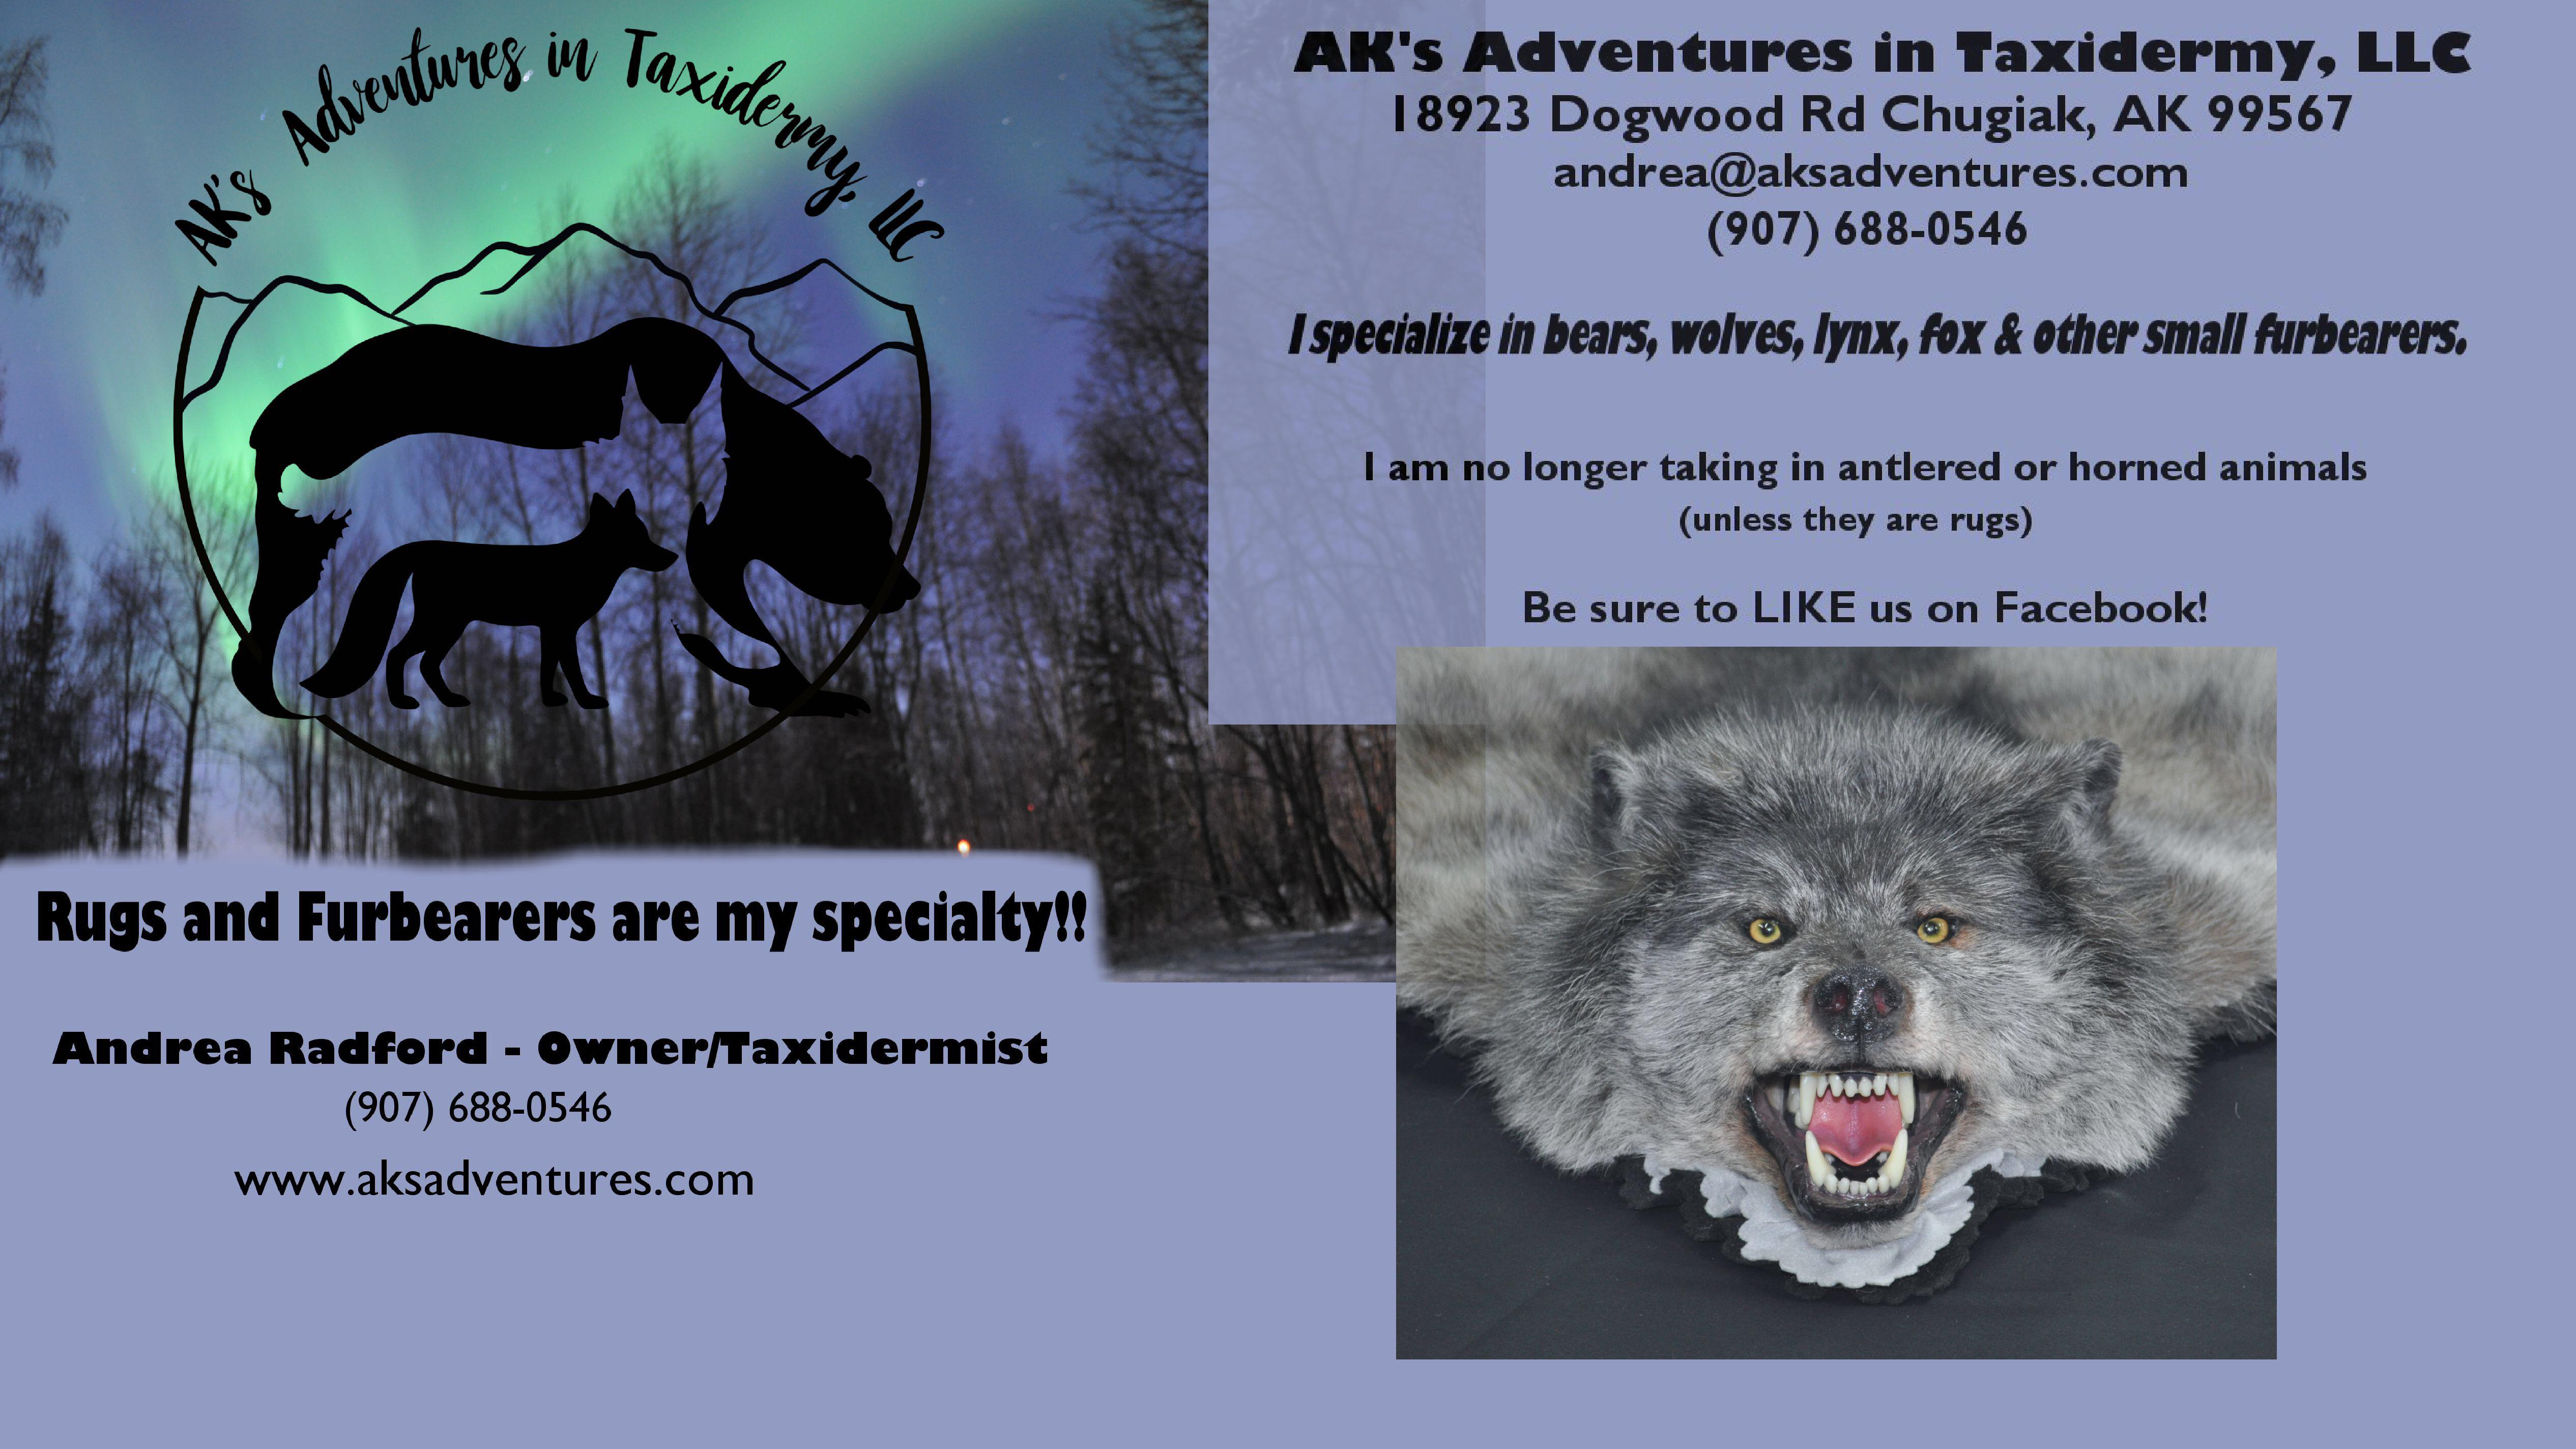 AK's Adventures in Taxidermy, LLC image 8